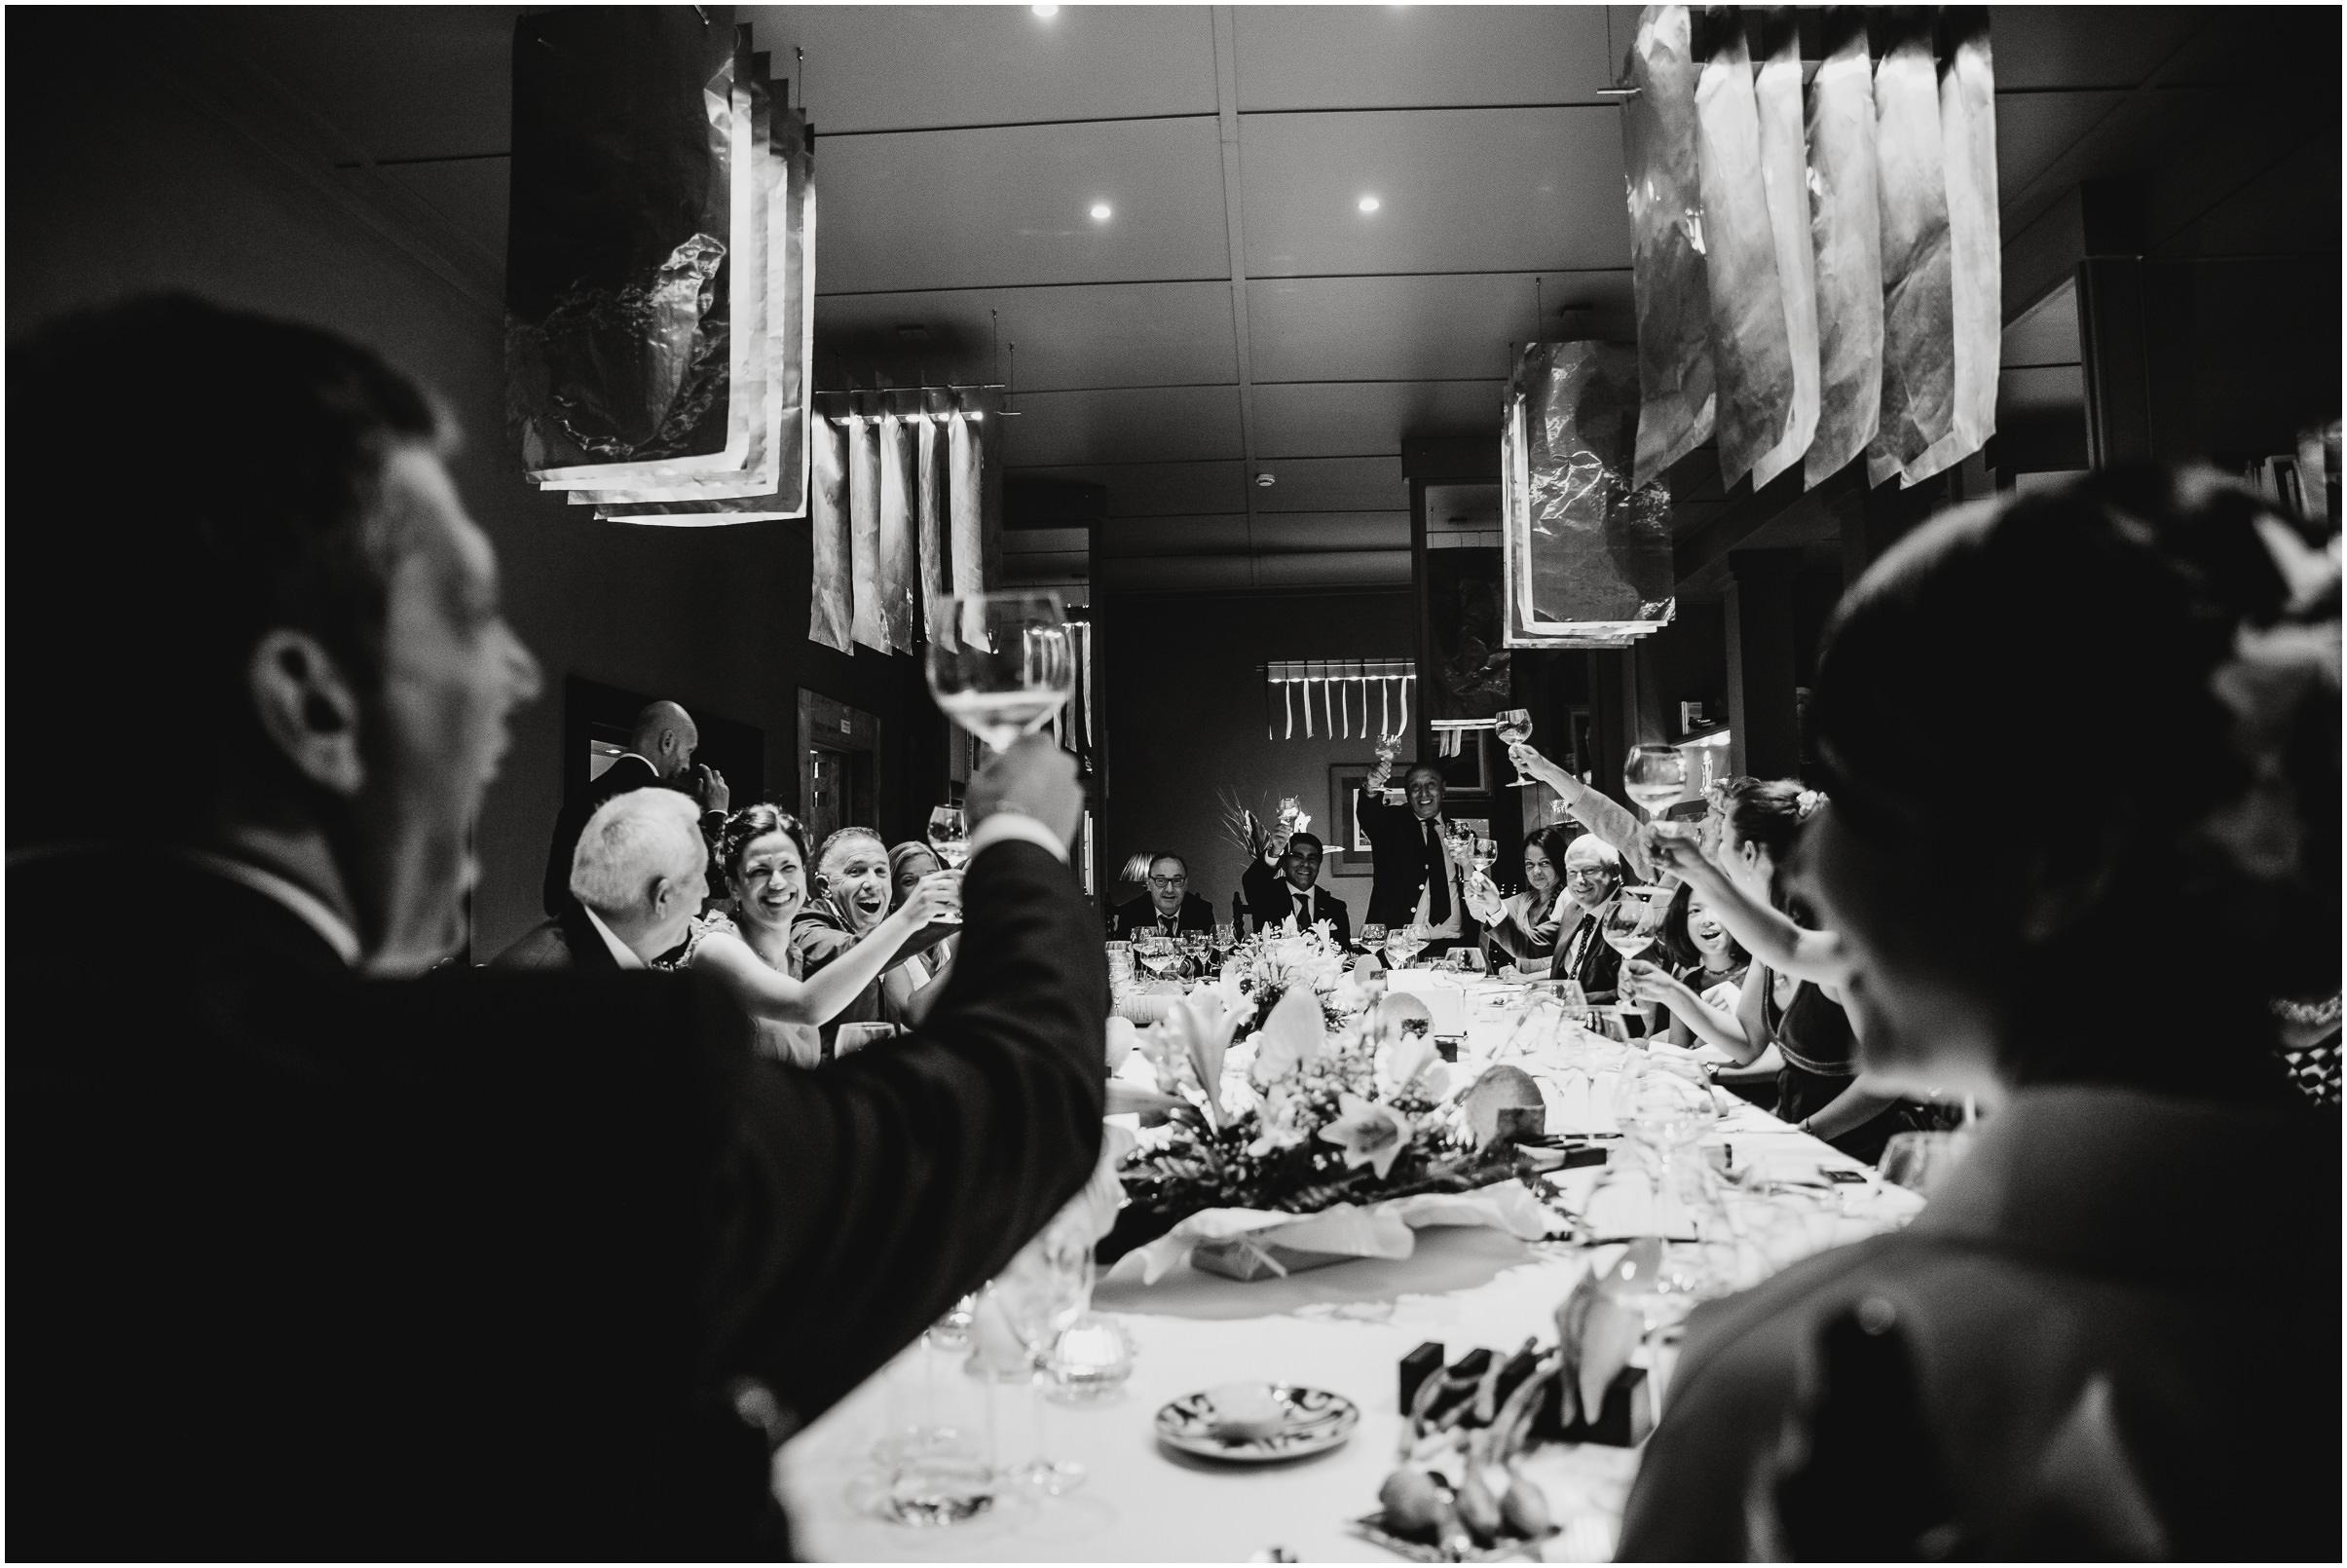 WEDDING-PHOTOGRAPHY-SARA-LORENZONI-FOTOGRAFIA-MATRIMONIO-ORVIETO-JUKA-ANTONELLO54